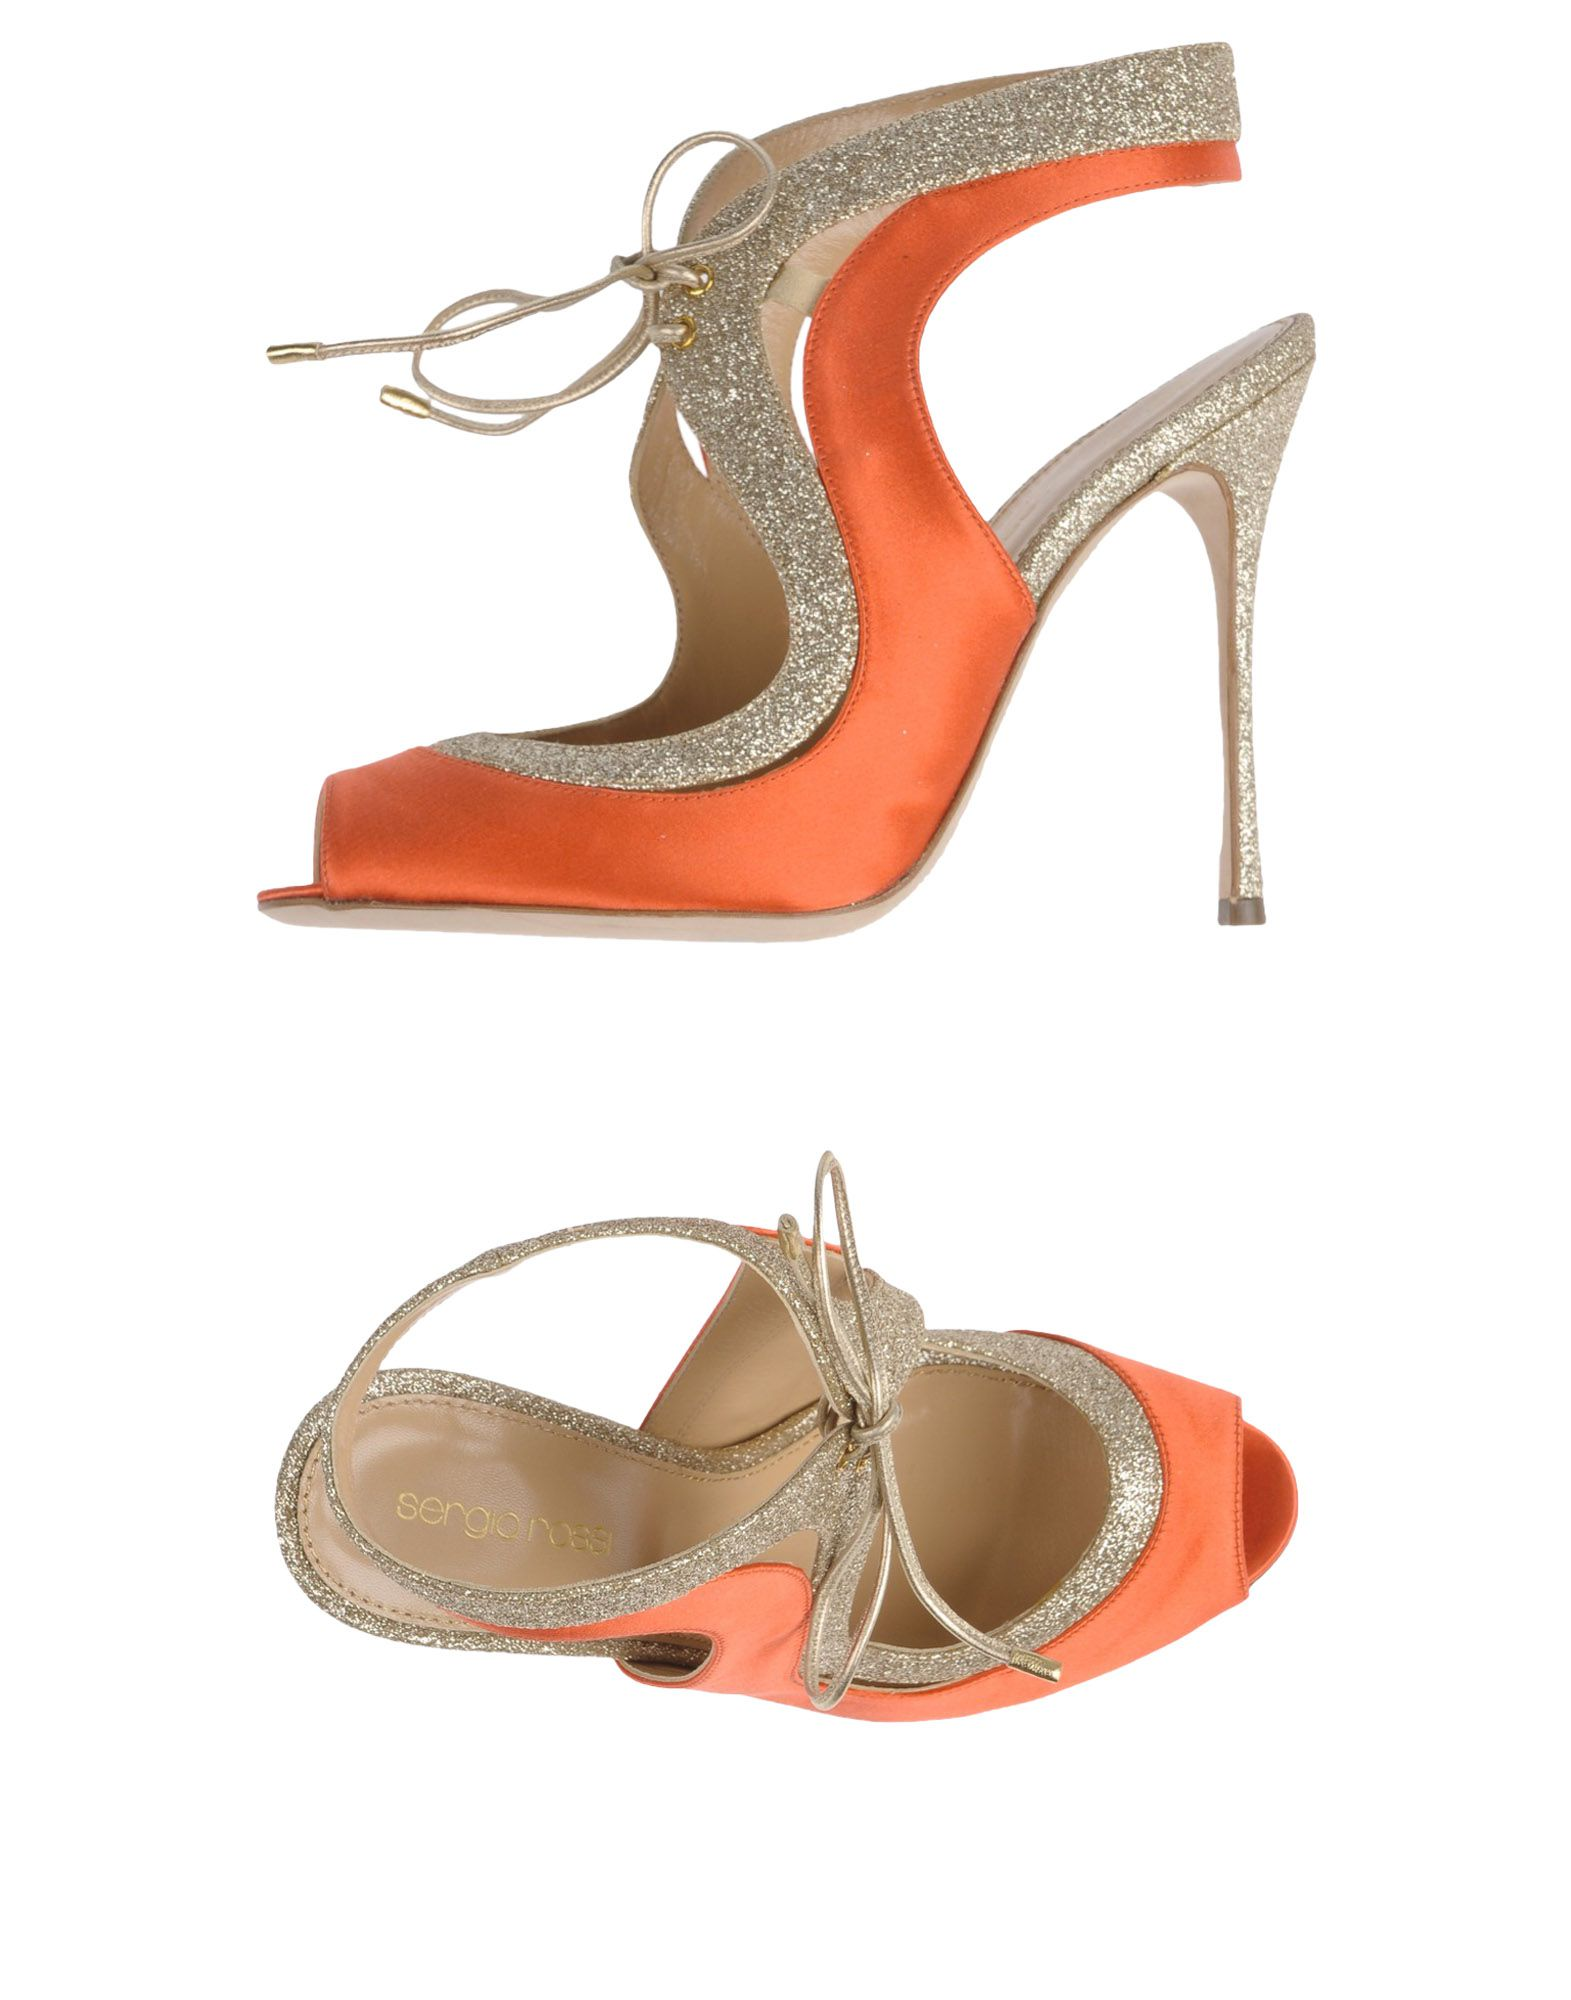 sergio rossi damen sandale farbe koralle gr e 7 jetztbilligerkaufen. Black Bedroom Furniture Sets. Home Design Ideas